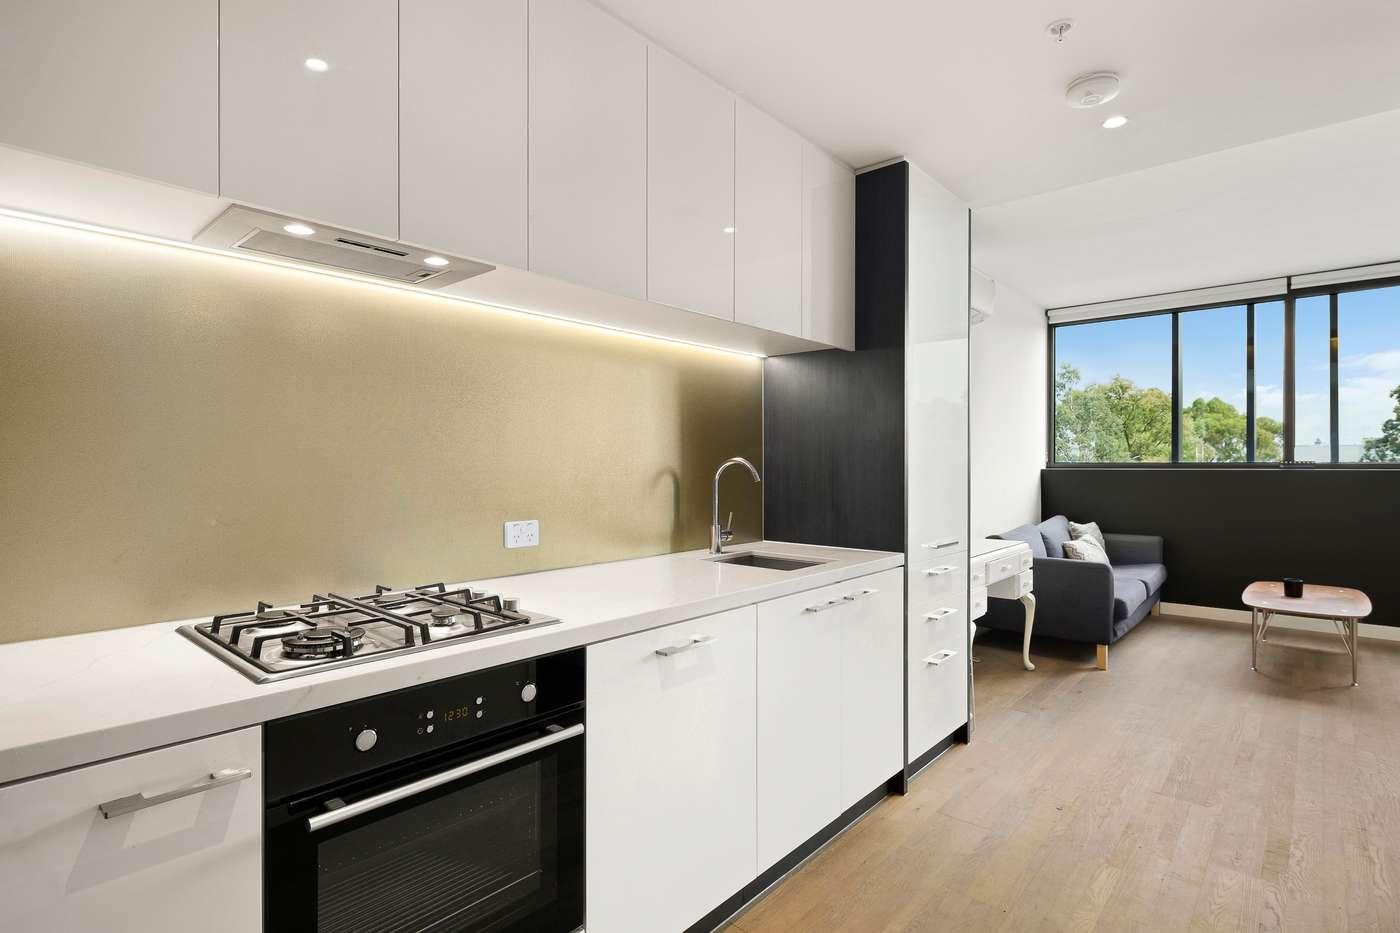 Main view of Homely apartment listing, 113/288 Albert Street, Brunswick, VIC 3056